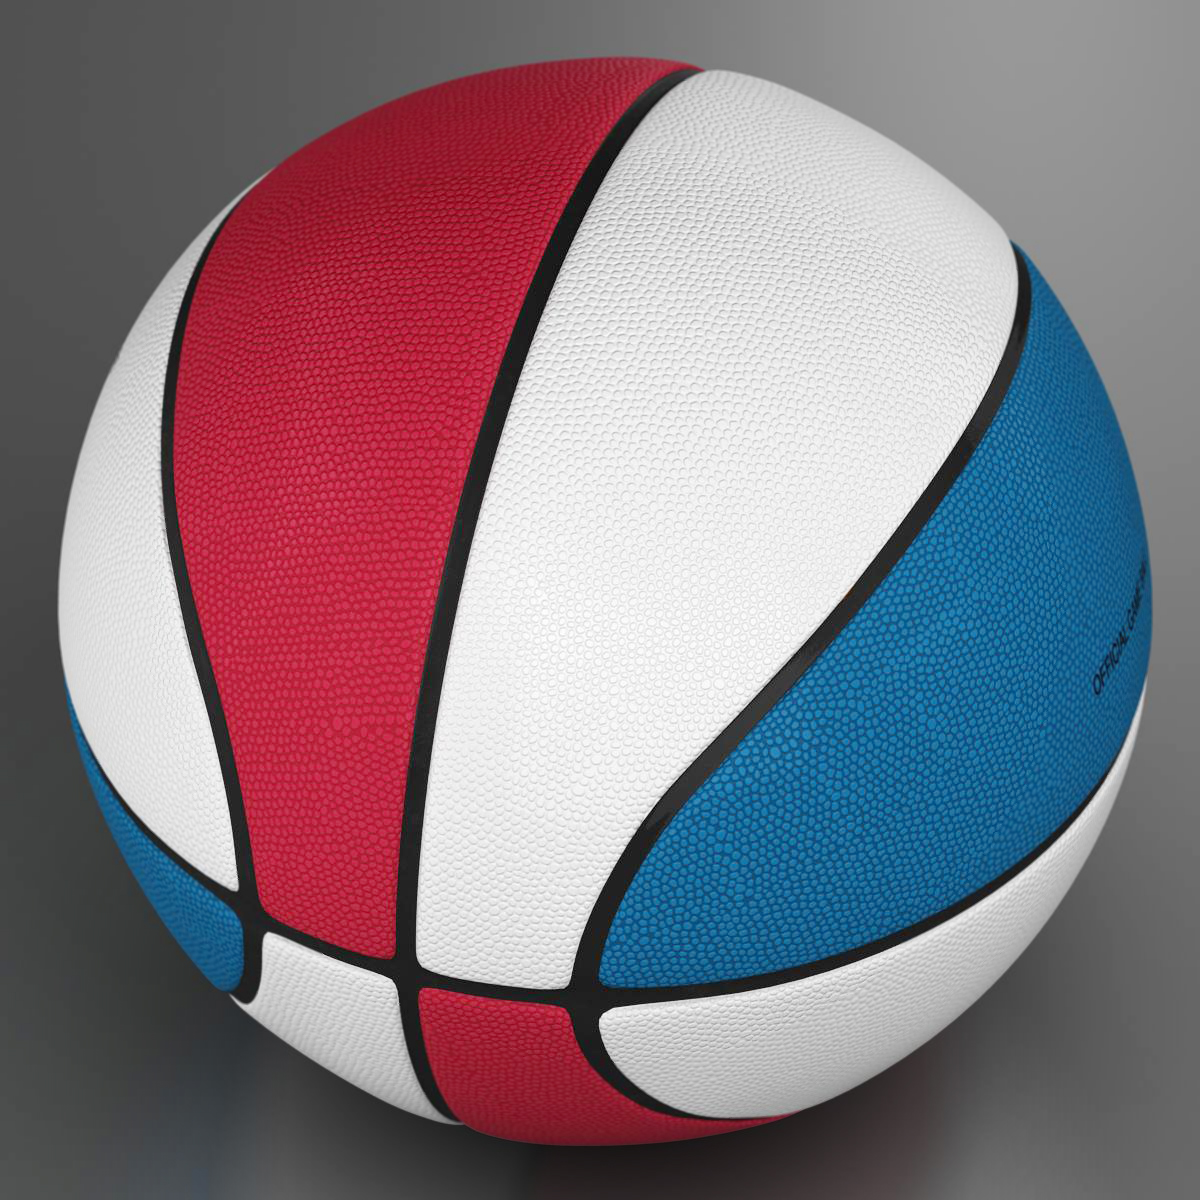 standard basketball ball 3d model 3ds max fbx c4d ma mb obj 164708